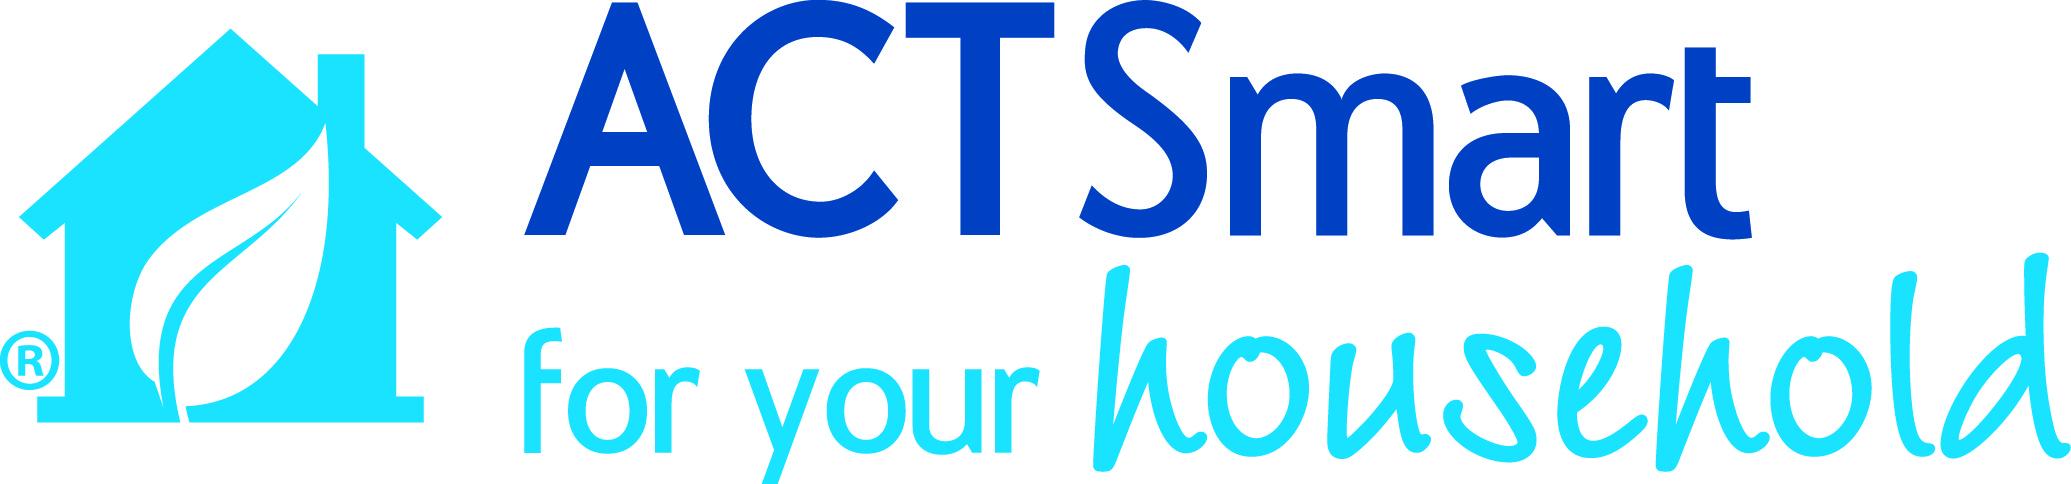 ACTSmart logo